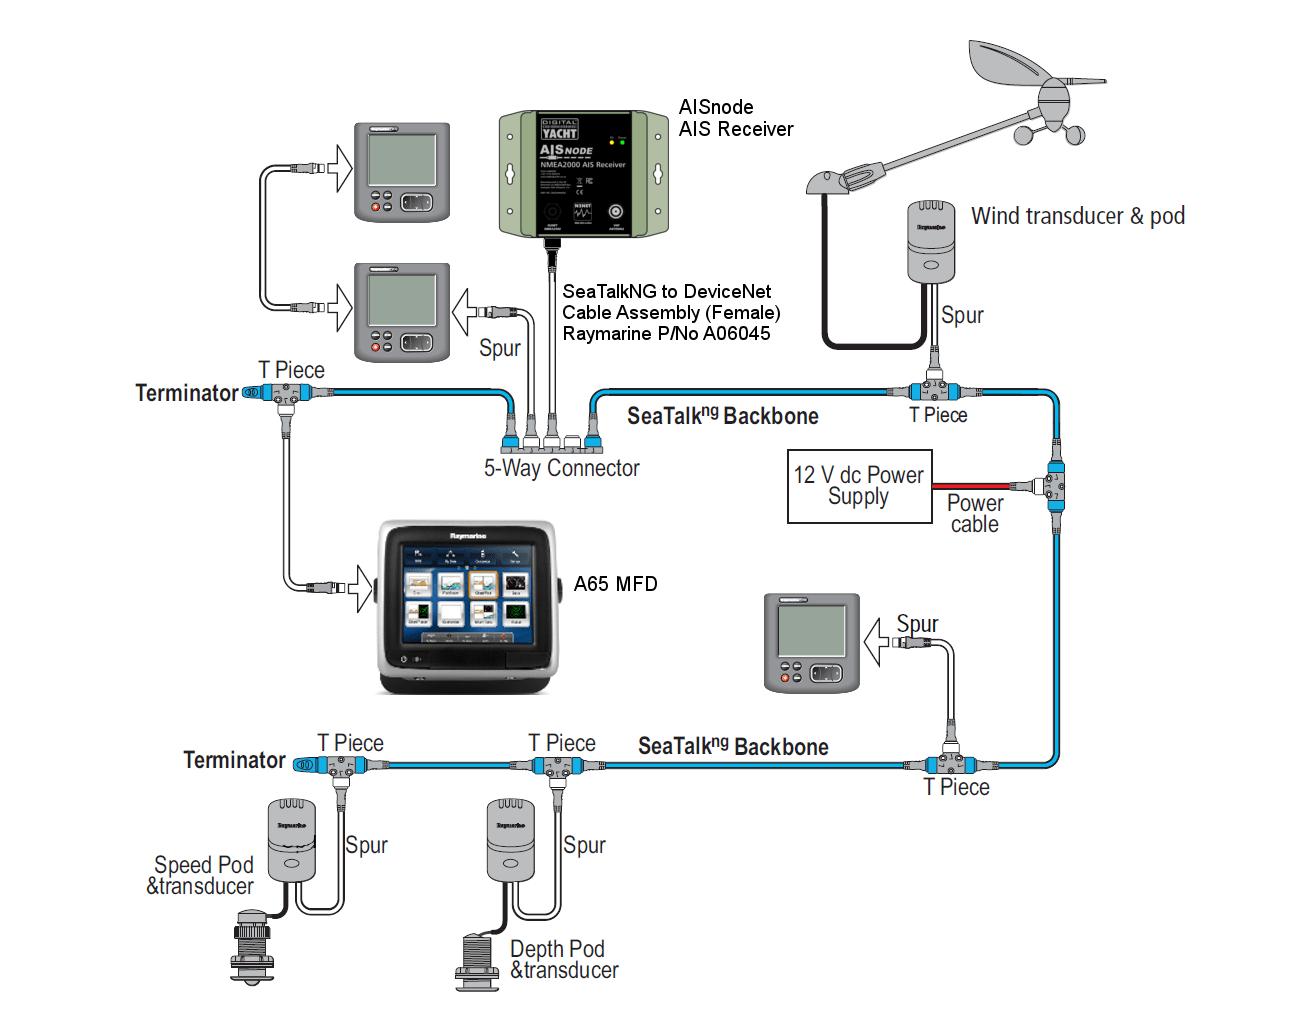 aisnode to raymarine seatalkng network 1?fit=1024%2C815&ssl=1 ais receiver digital yacht news nasa ais engine wiring diagram at reclaimingppi.co